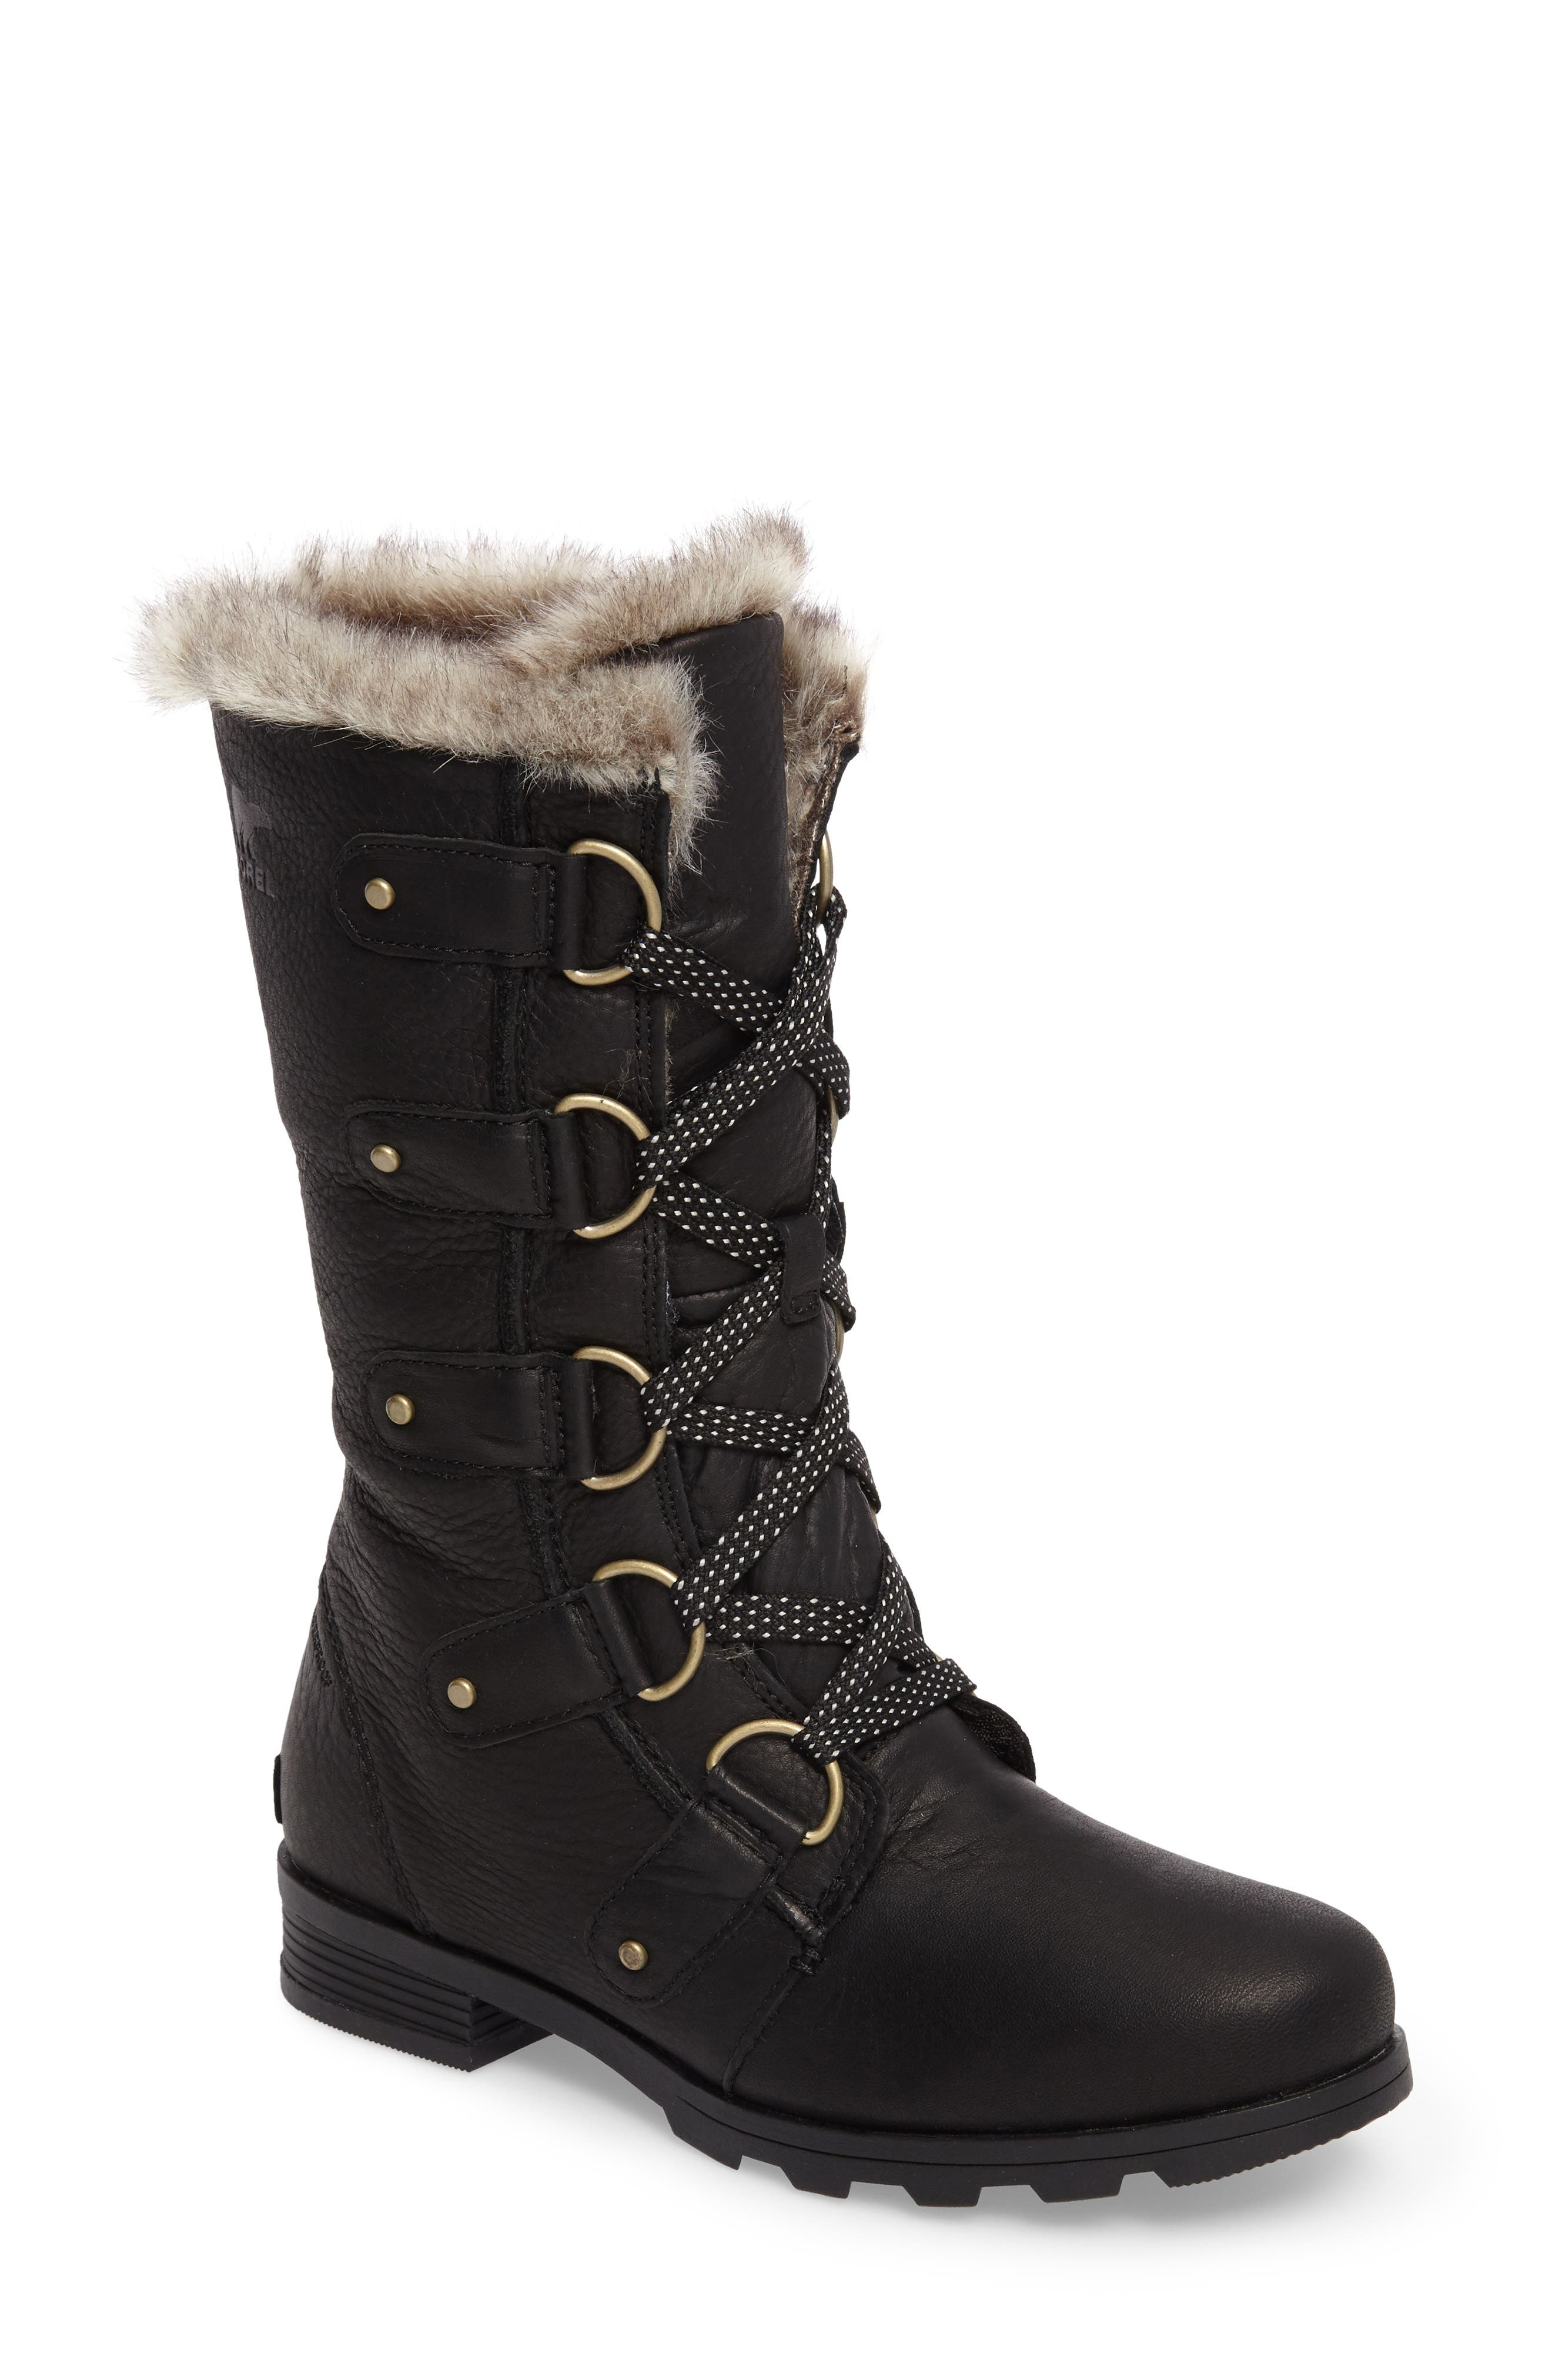 Emelie Waterproof Lace Up Boot with Faux Fur Trim,                             Main thumbnail 1, color,                             010